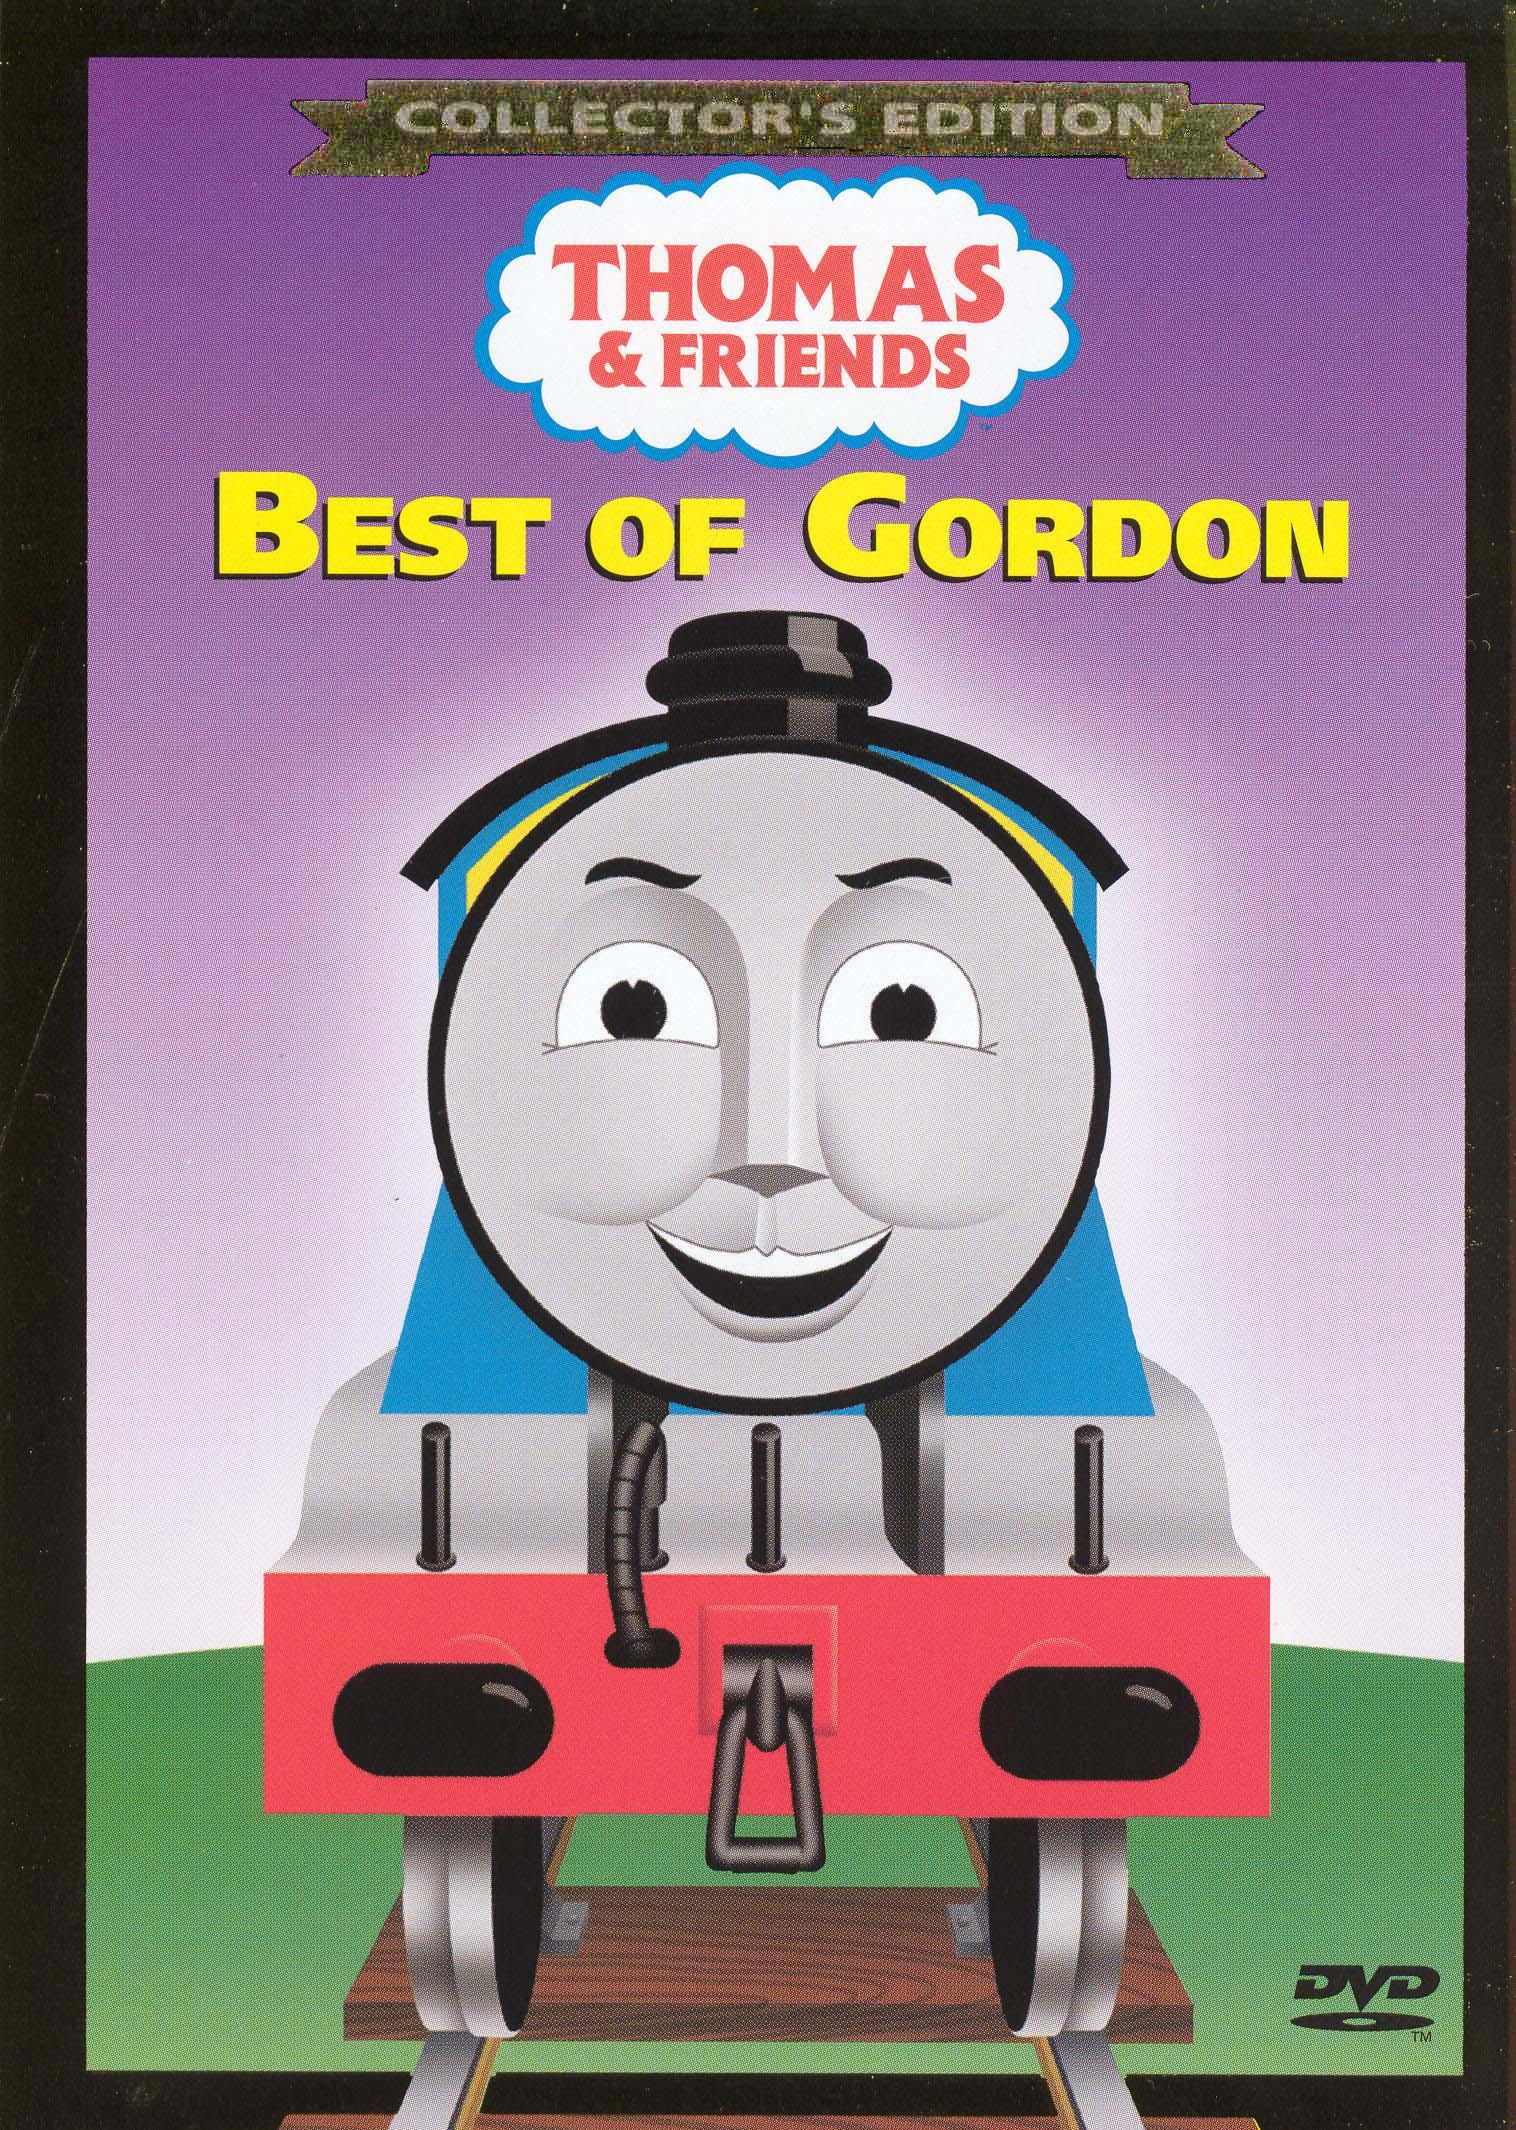 Best of Gordon